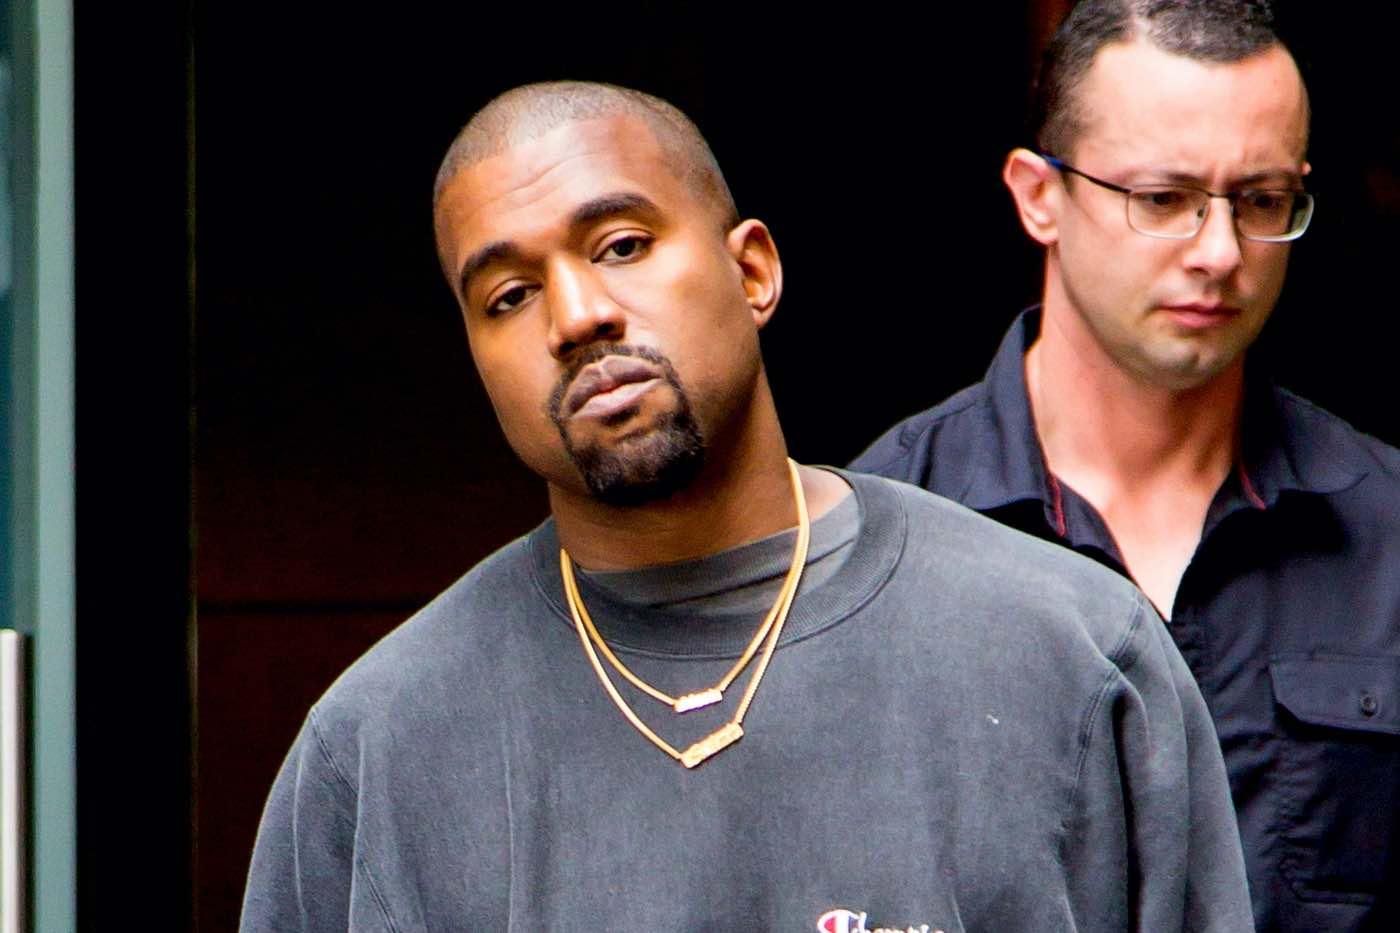 Llámalo 'Ye' ahora, ya no más Kanye West